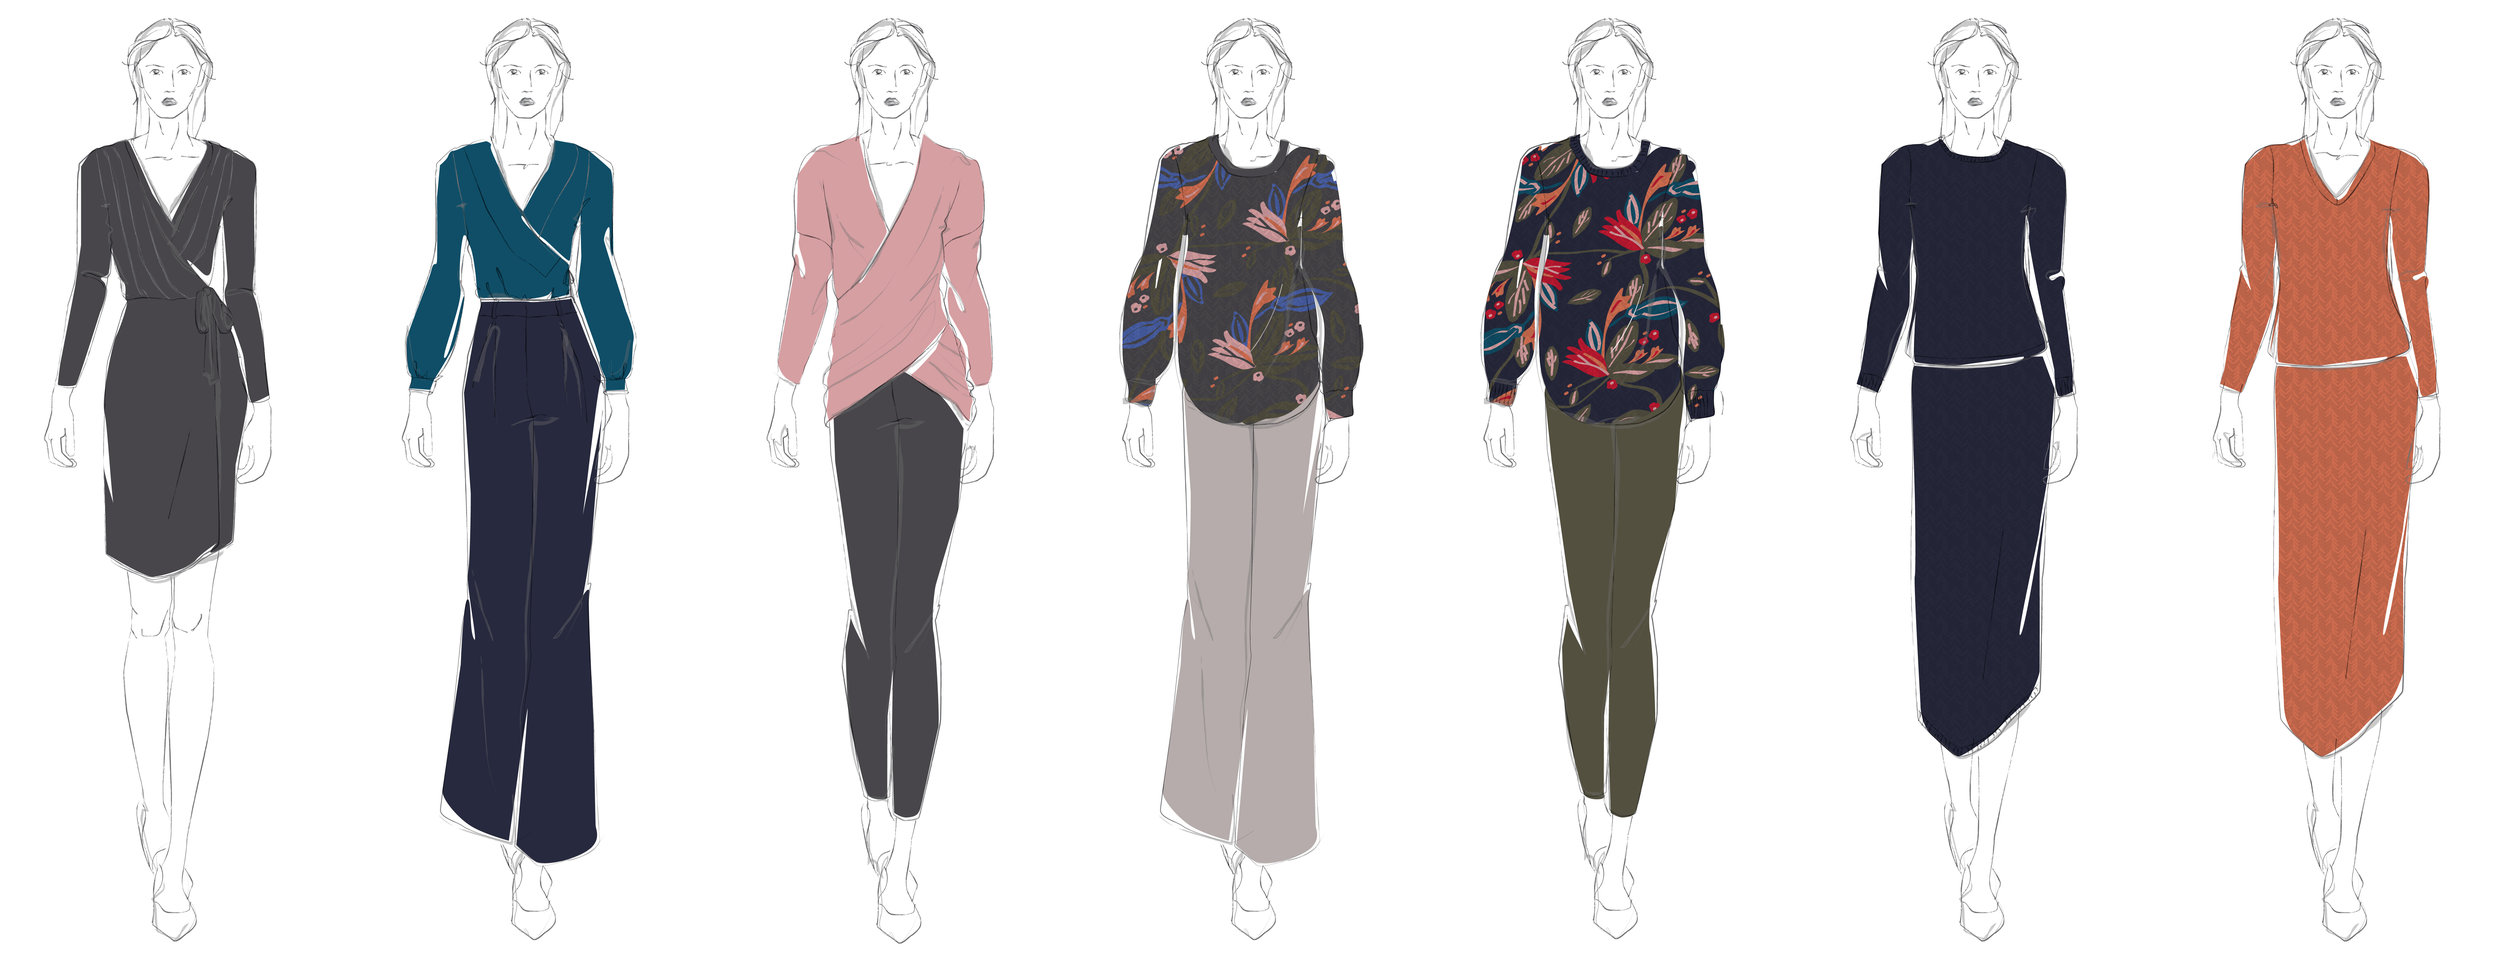 Initial Design Line Sketch; Fall 2018, Teat & Cosset